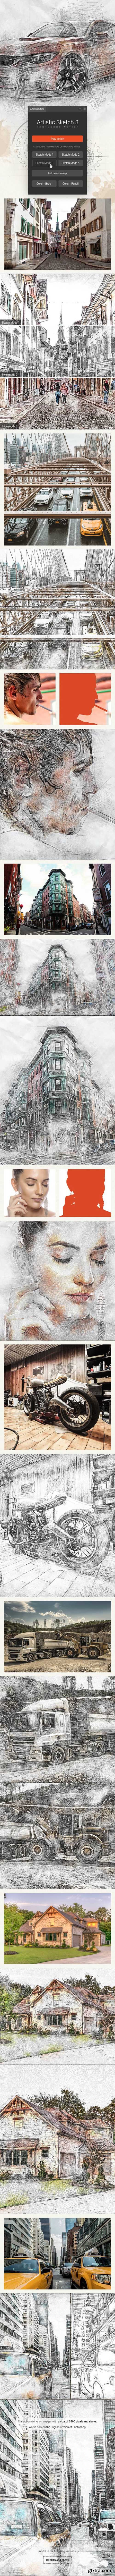 GraphicRiver - Artistic Sketch 3 Photoshop Action 24778778